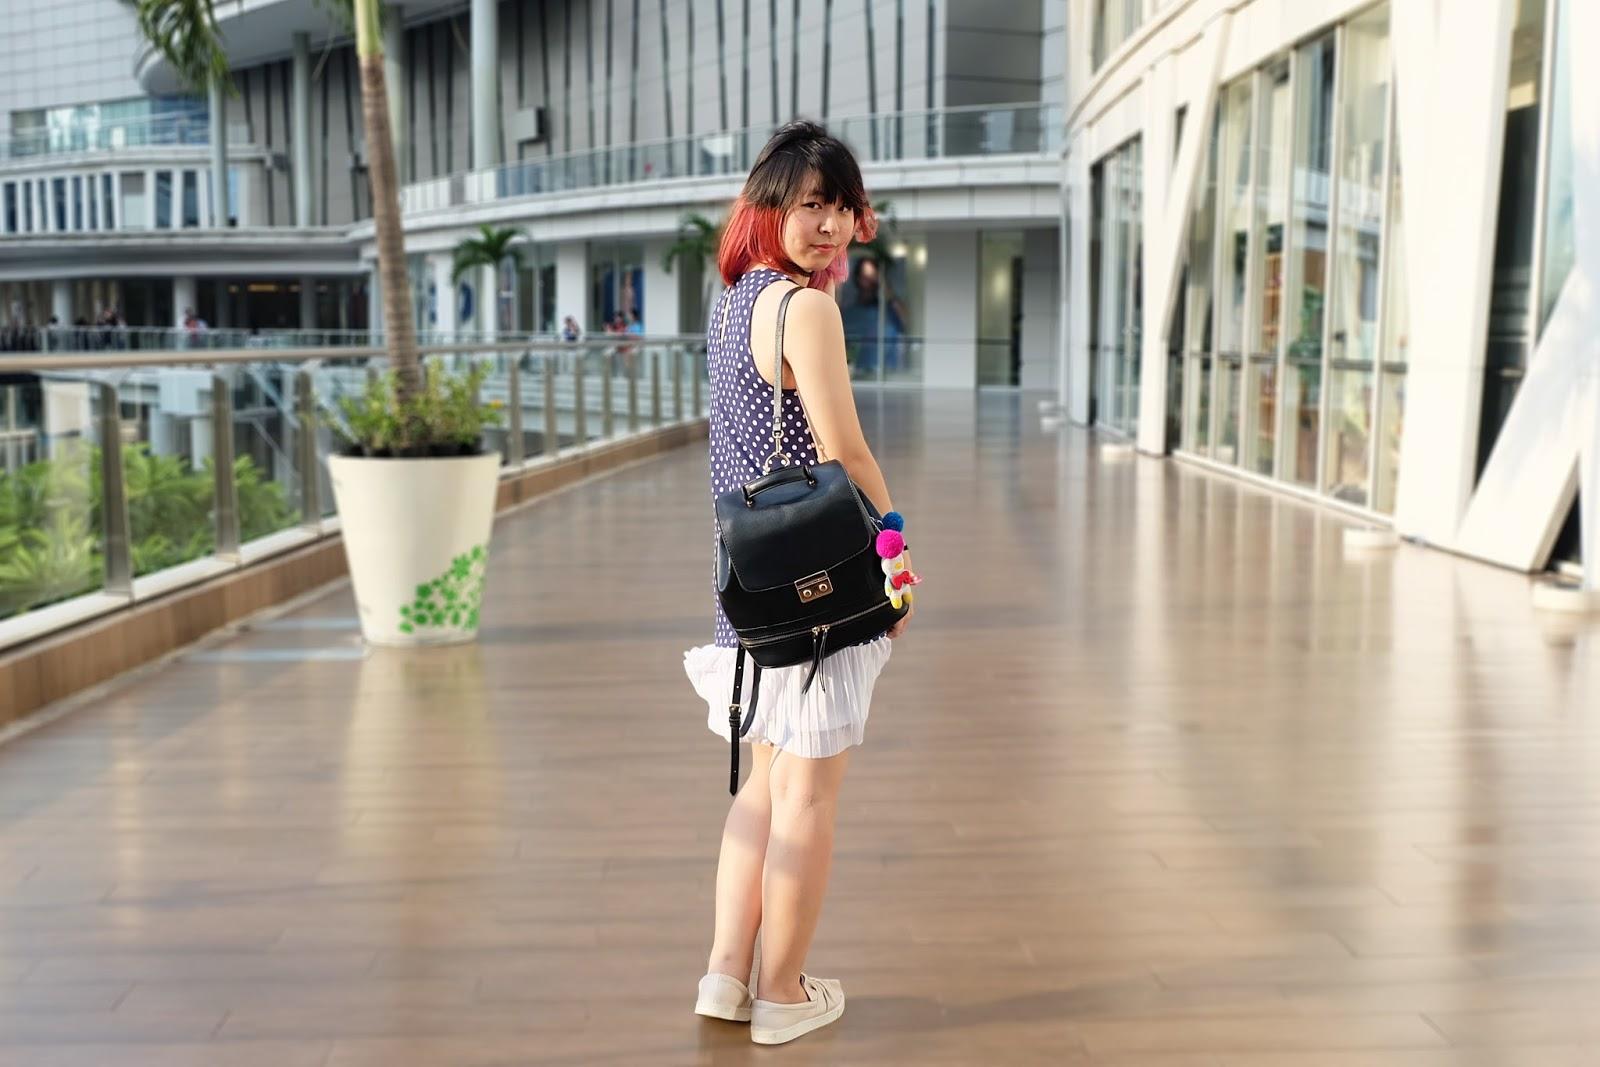 polkadot sleeveless dress outfit | bigdreamerblog.com